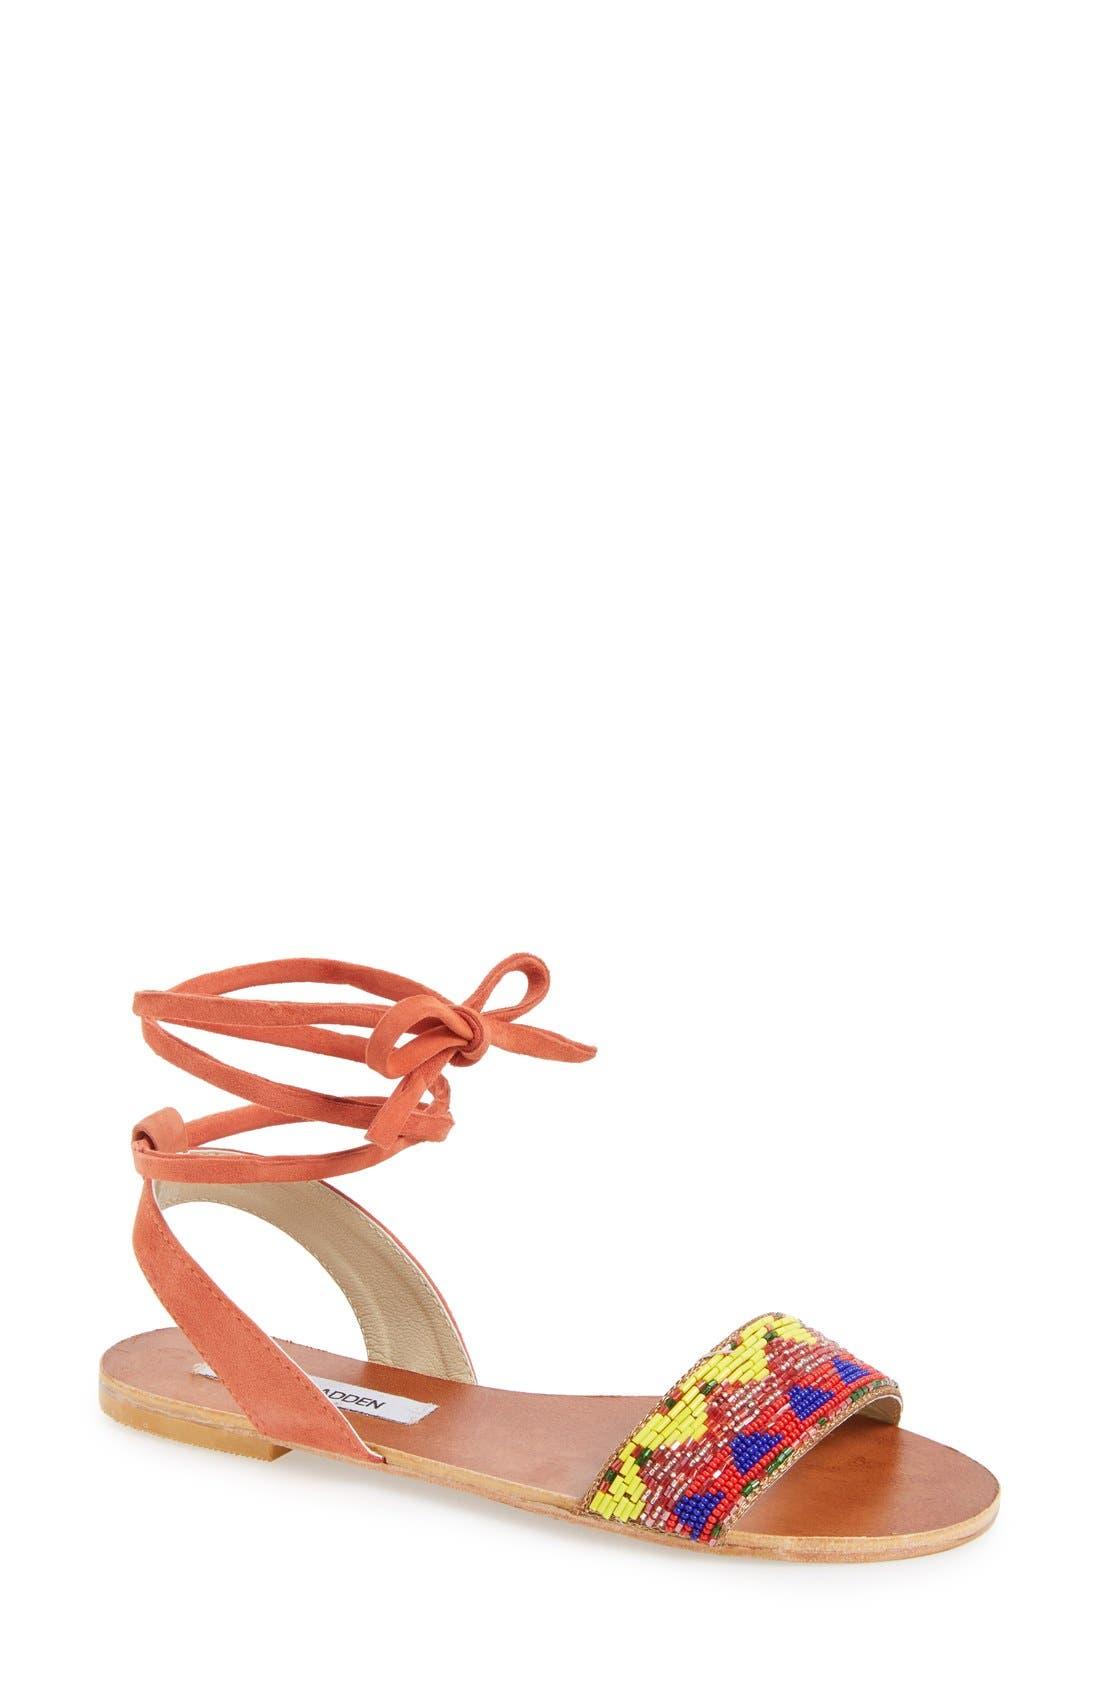 'Shaney' Beaded Wraparound Lace Sandal,                         Main,                         color, Bright Multi